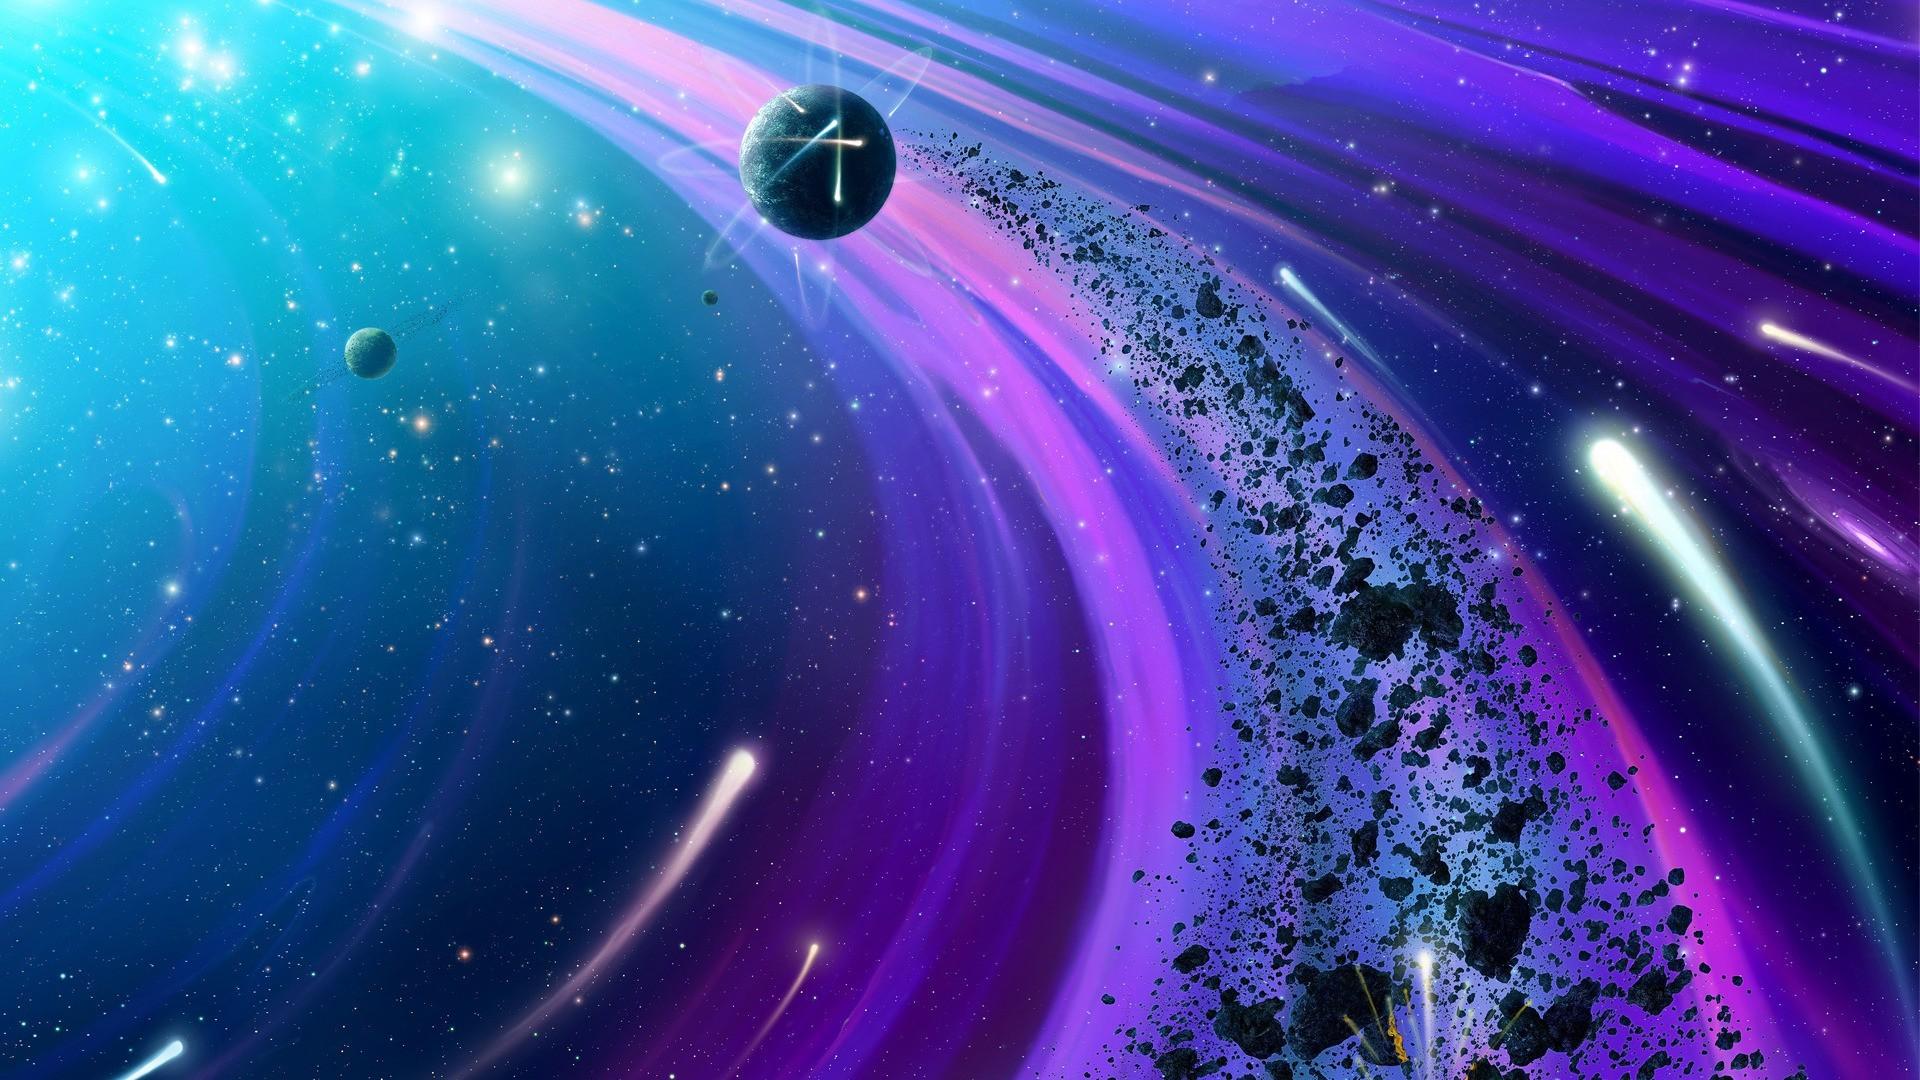 HD Space Wallpaper.